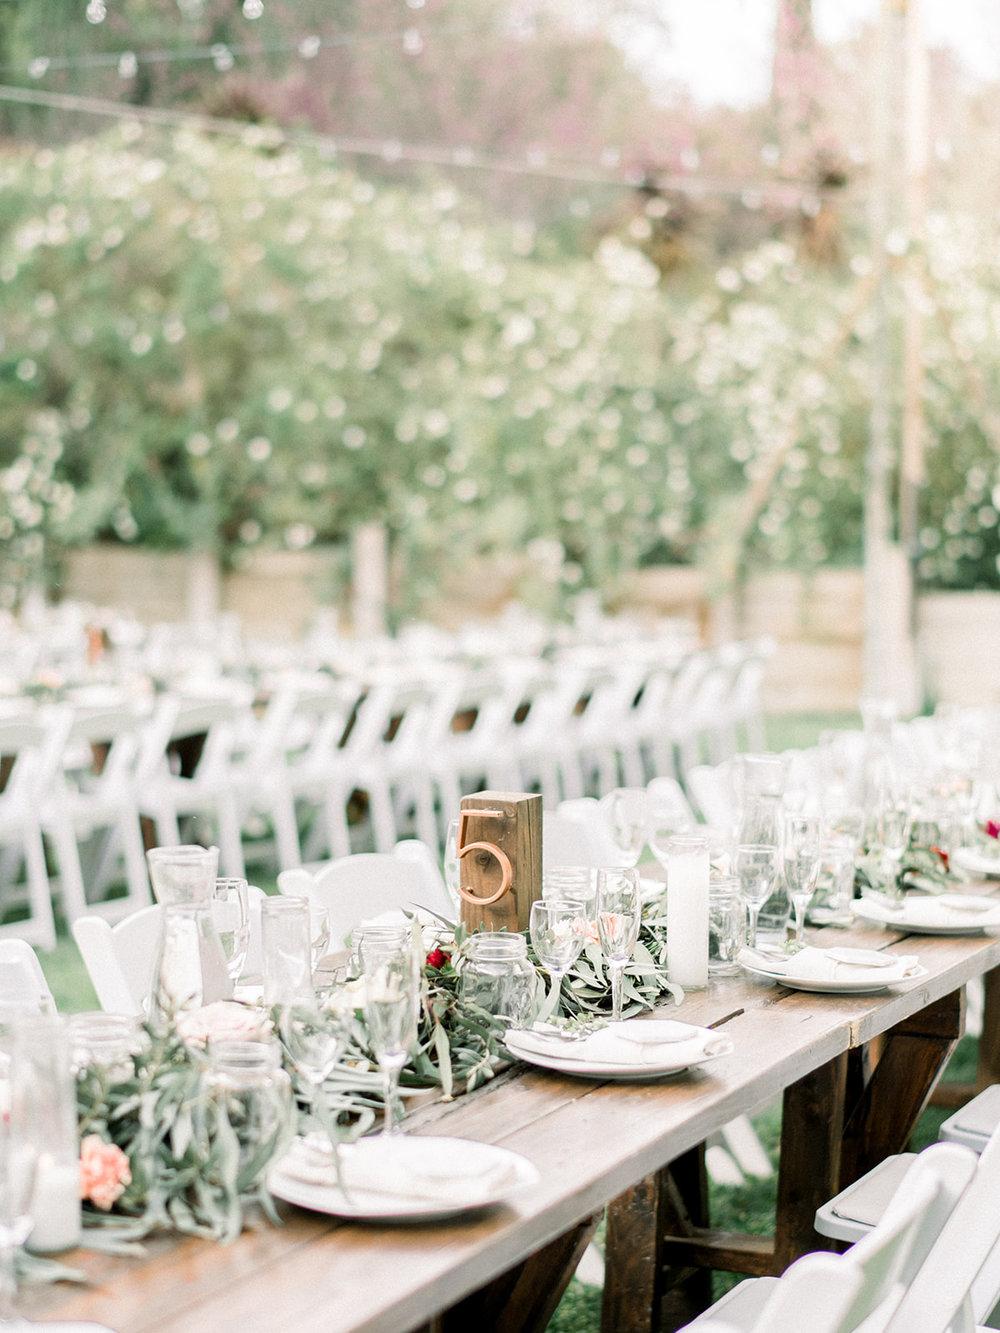 jueunandjon-etherandsmith-wedding-1036.jpg